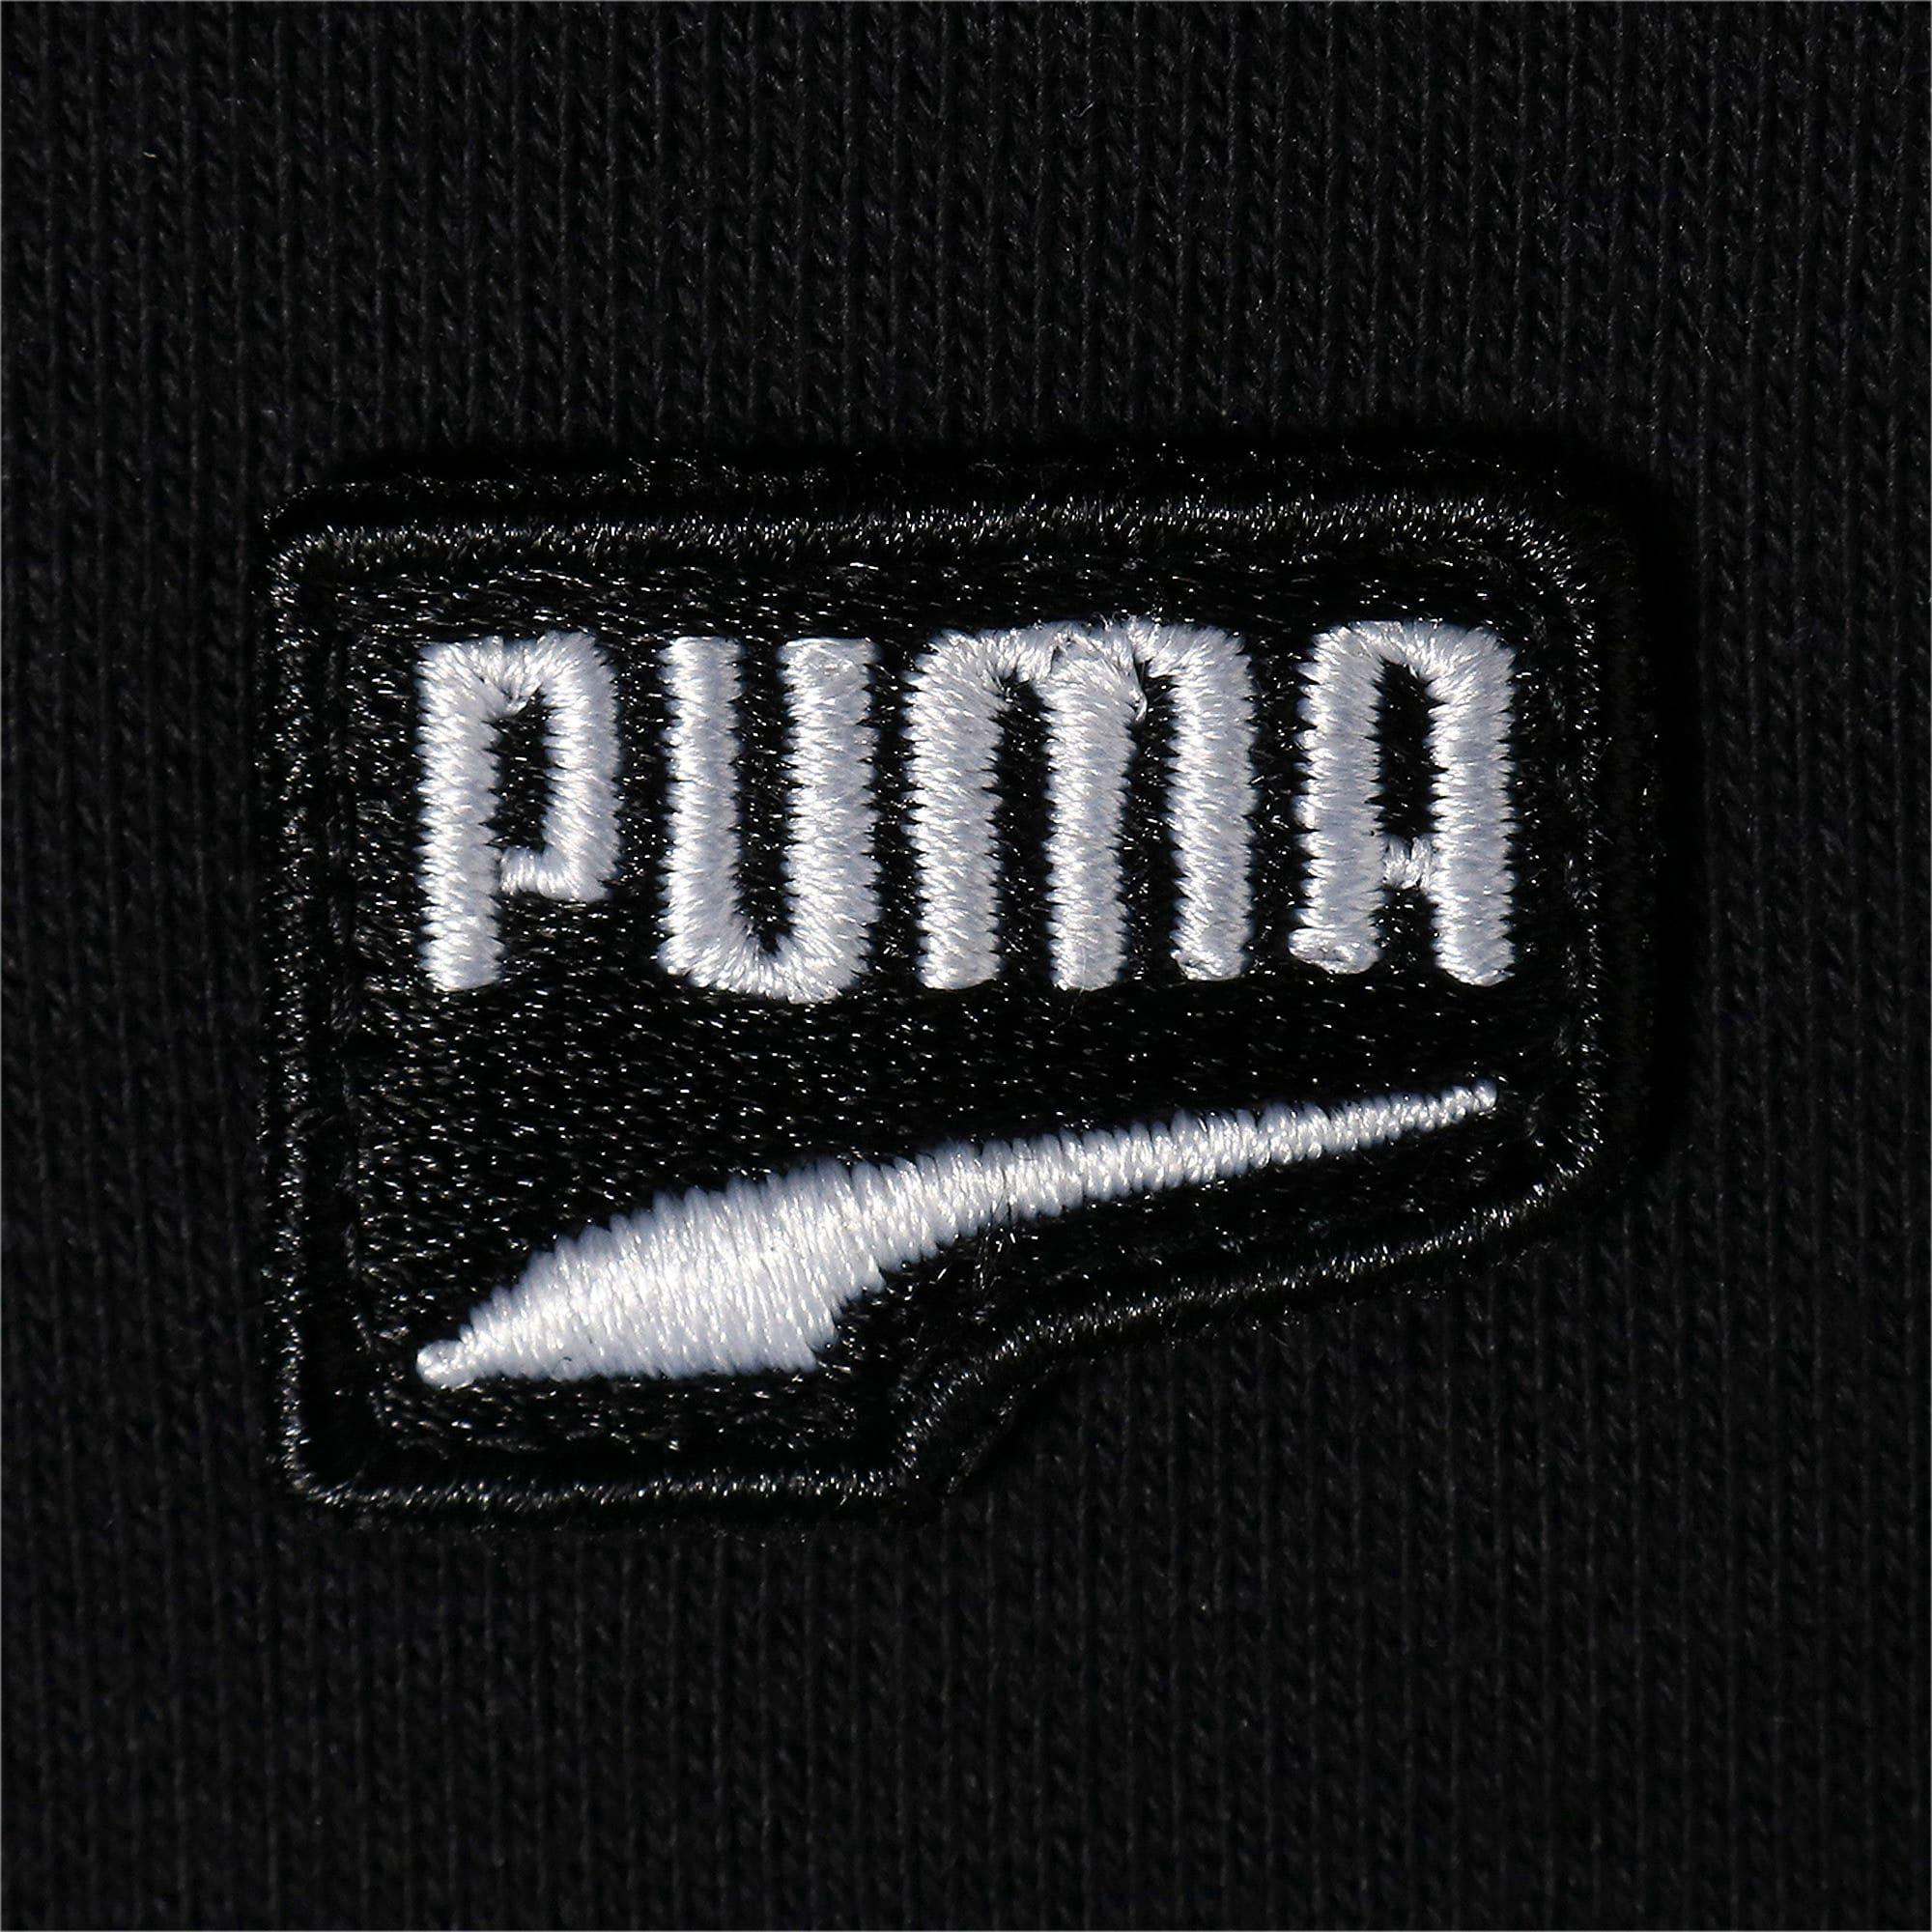 Thumbnail 7 of ダウンタウン クルースウェット, Puma Black, medium-JPN